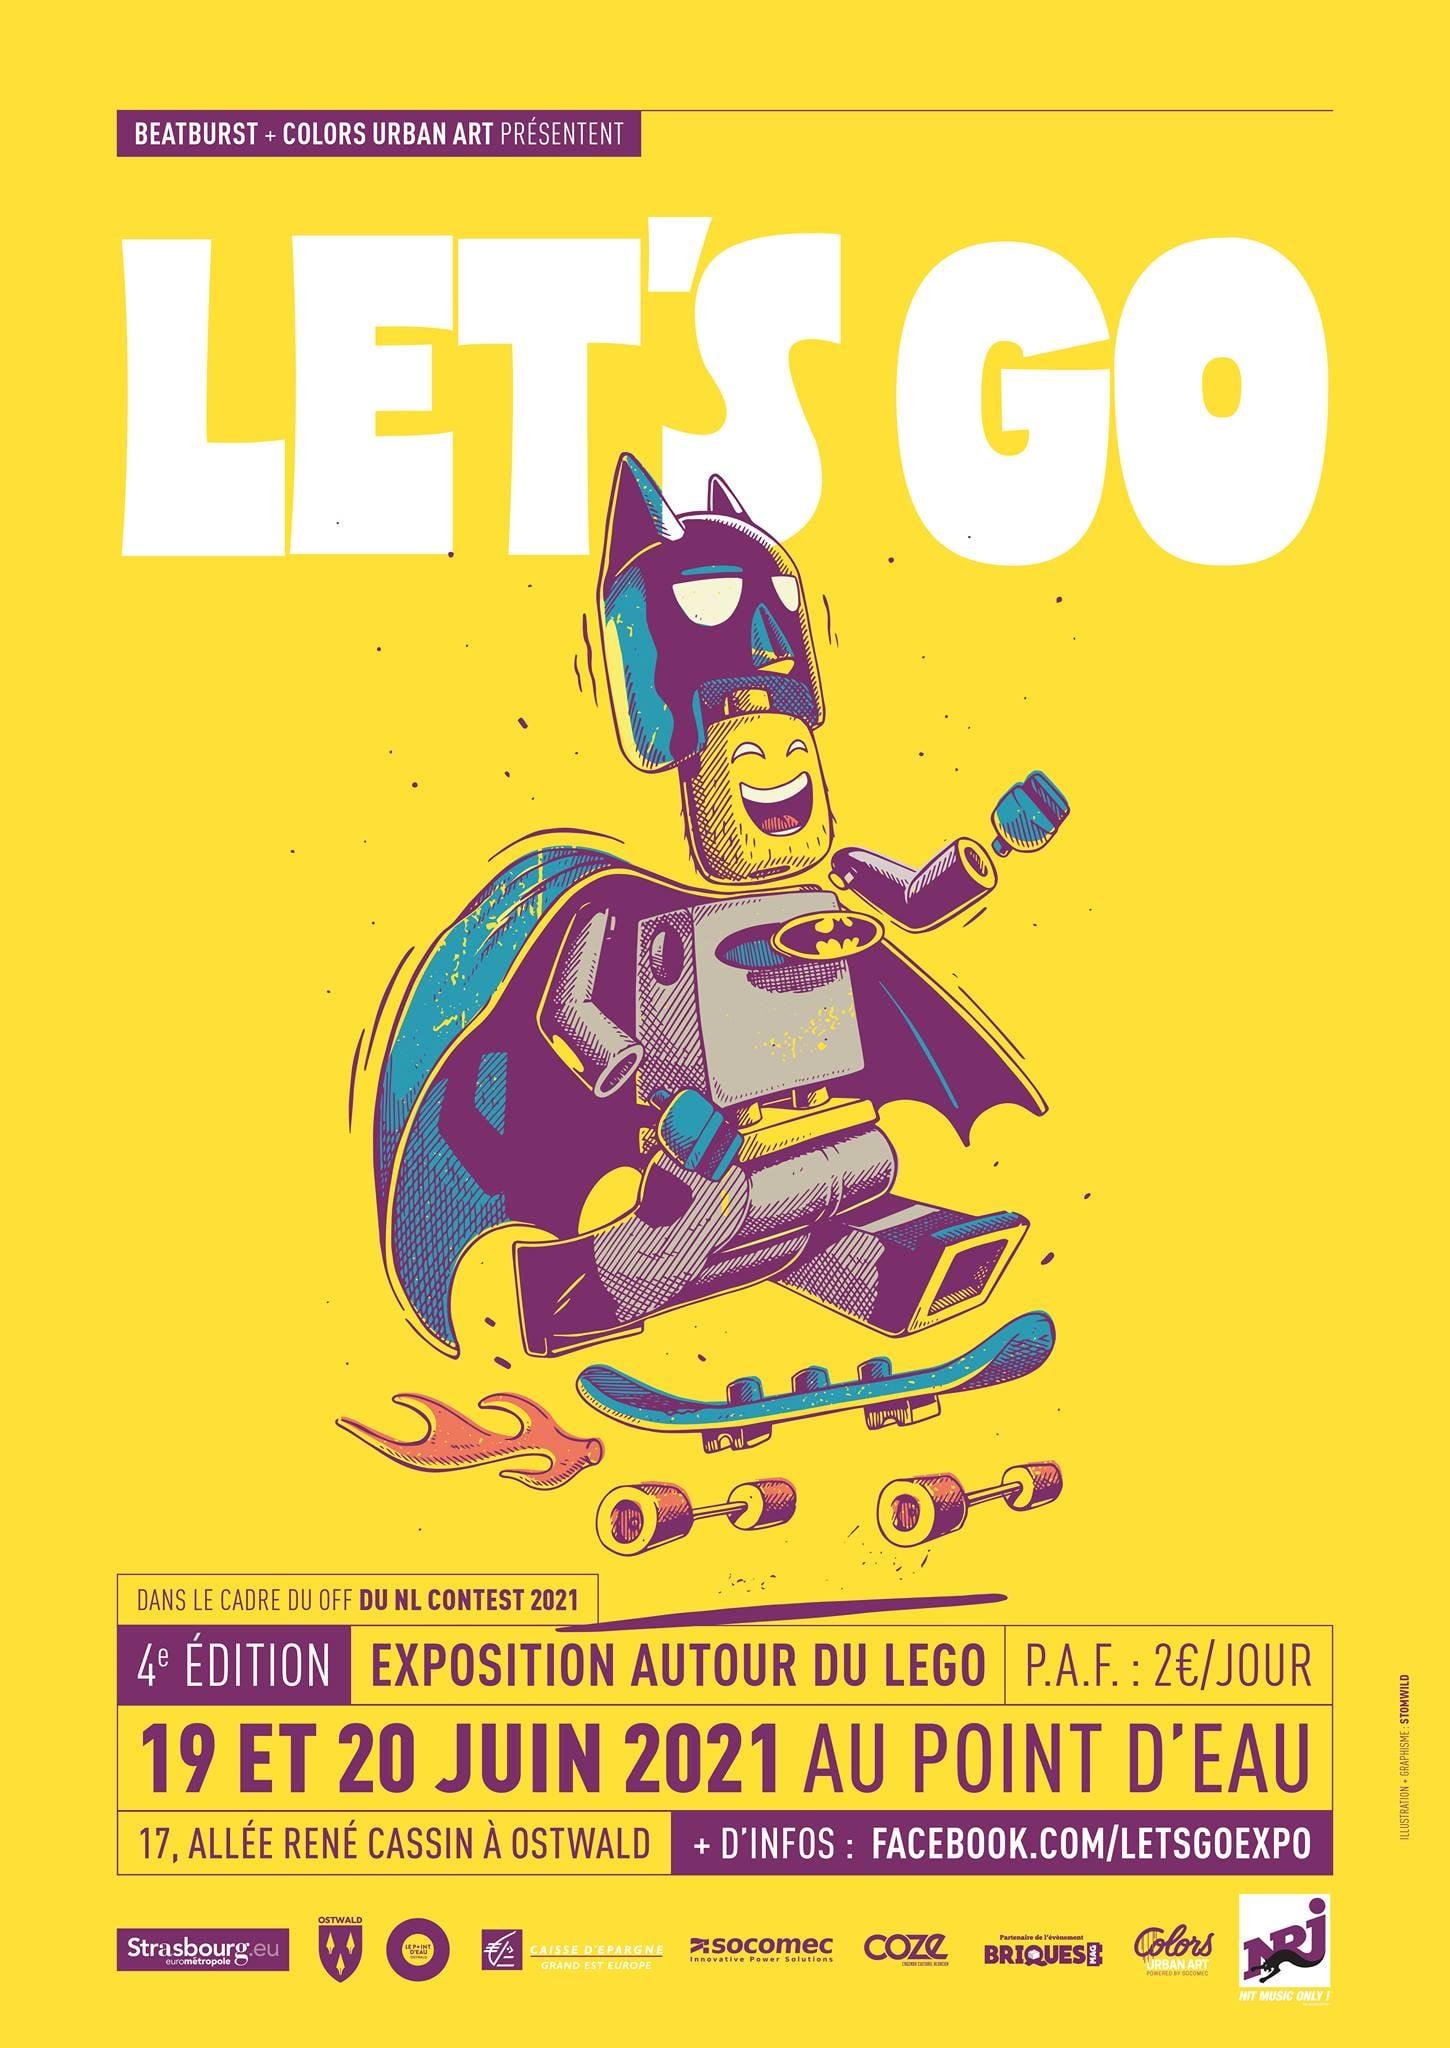 Expo LEGO Let's Go 2021 à Ostwald - Supacat Street Art Strasbourg